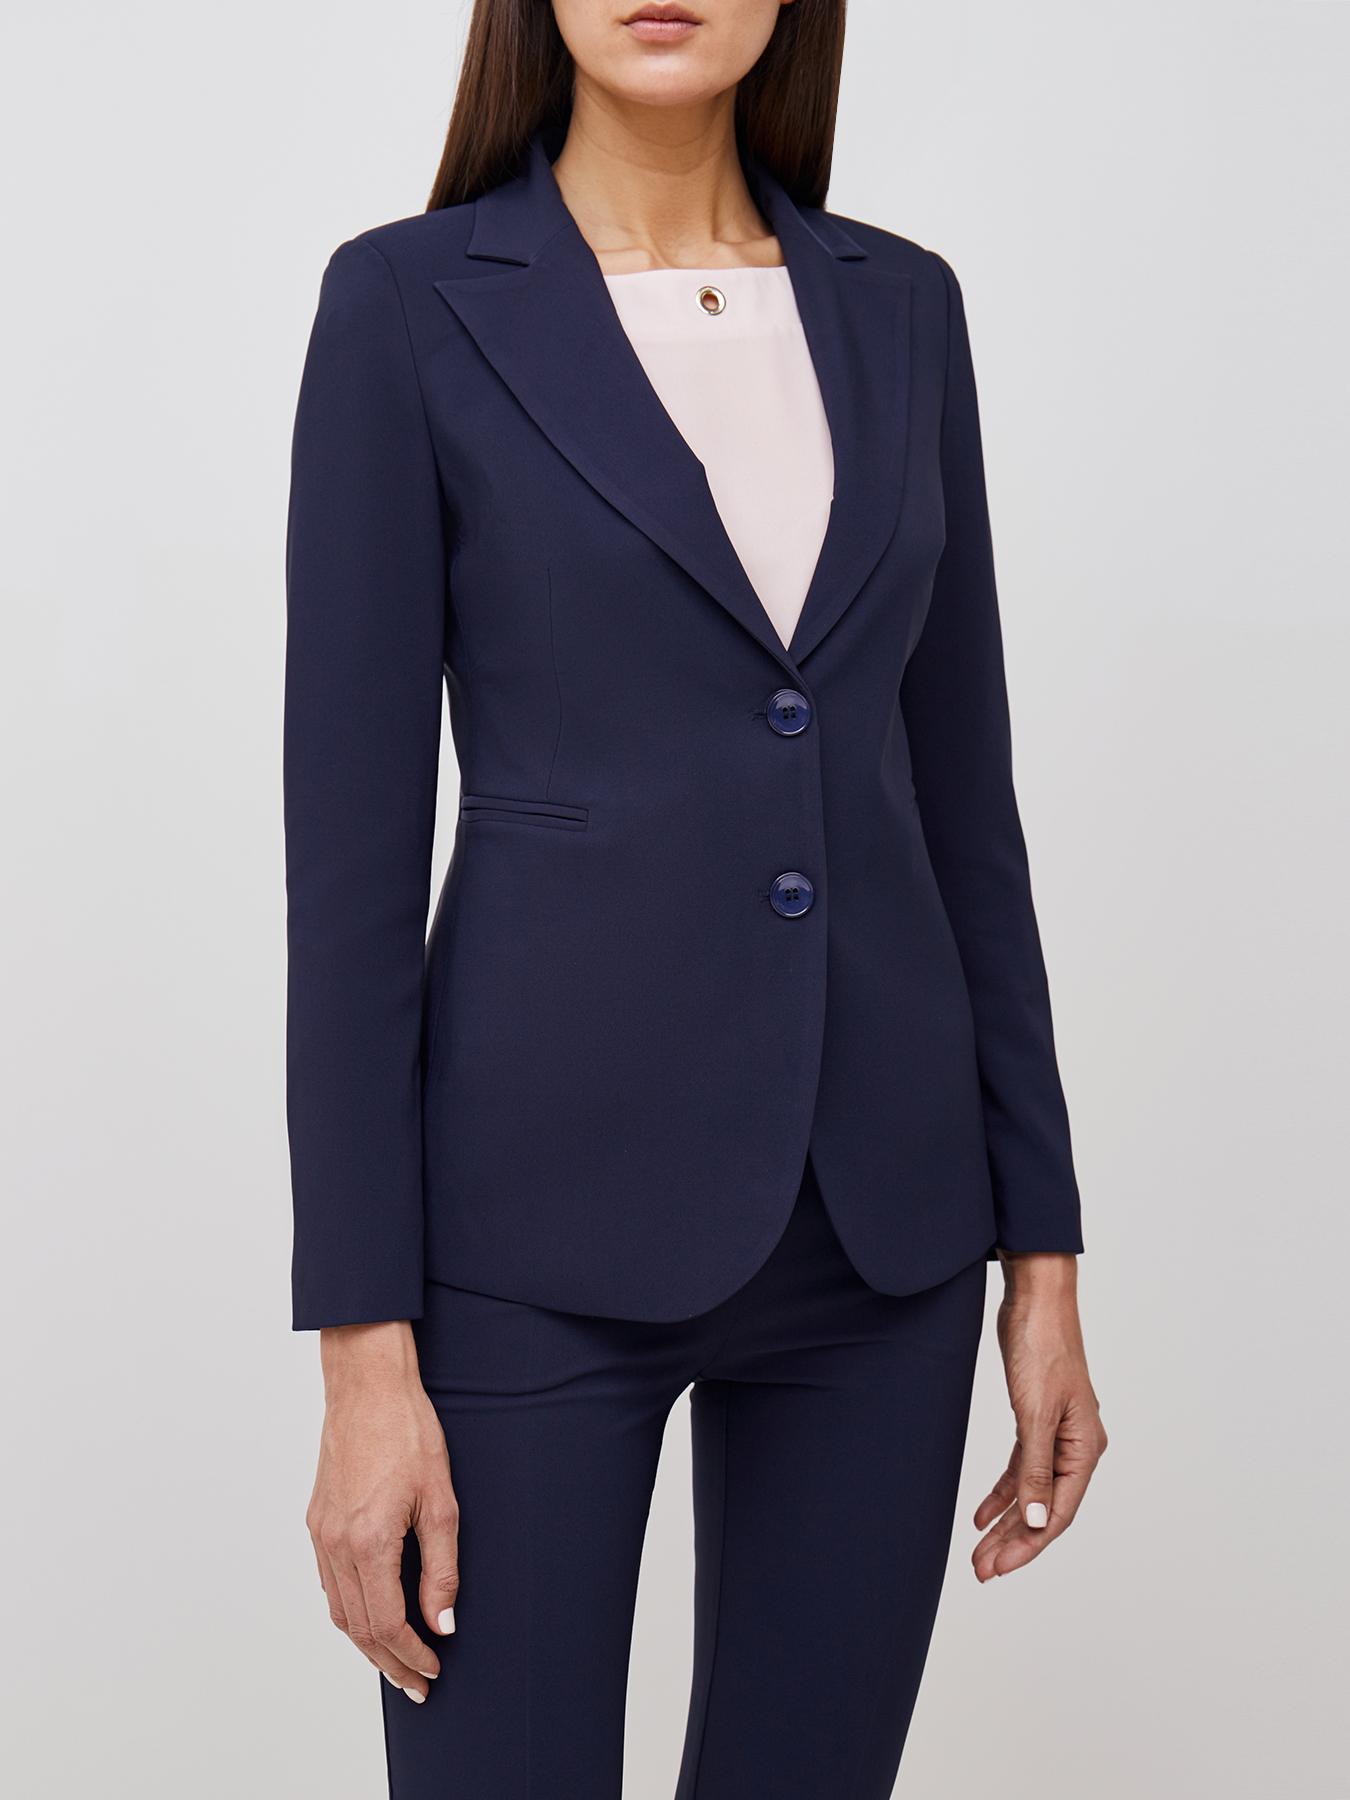 Пиджаки Rinascimento Женский пиджак женский пиджак brand new v 42346